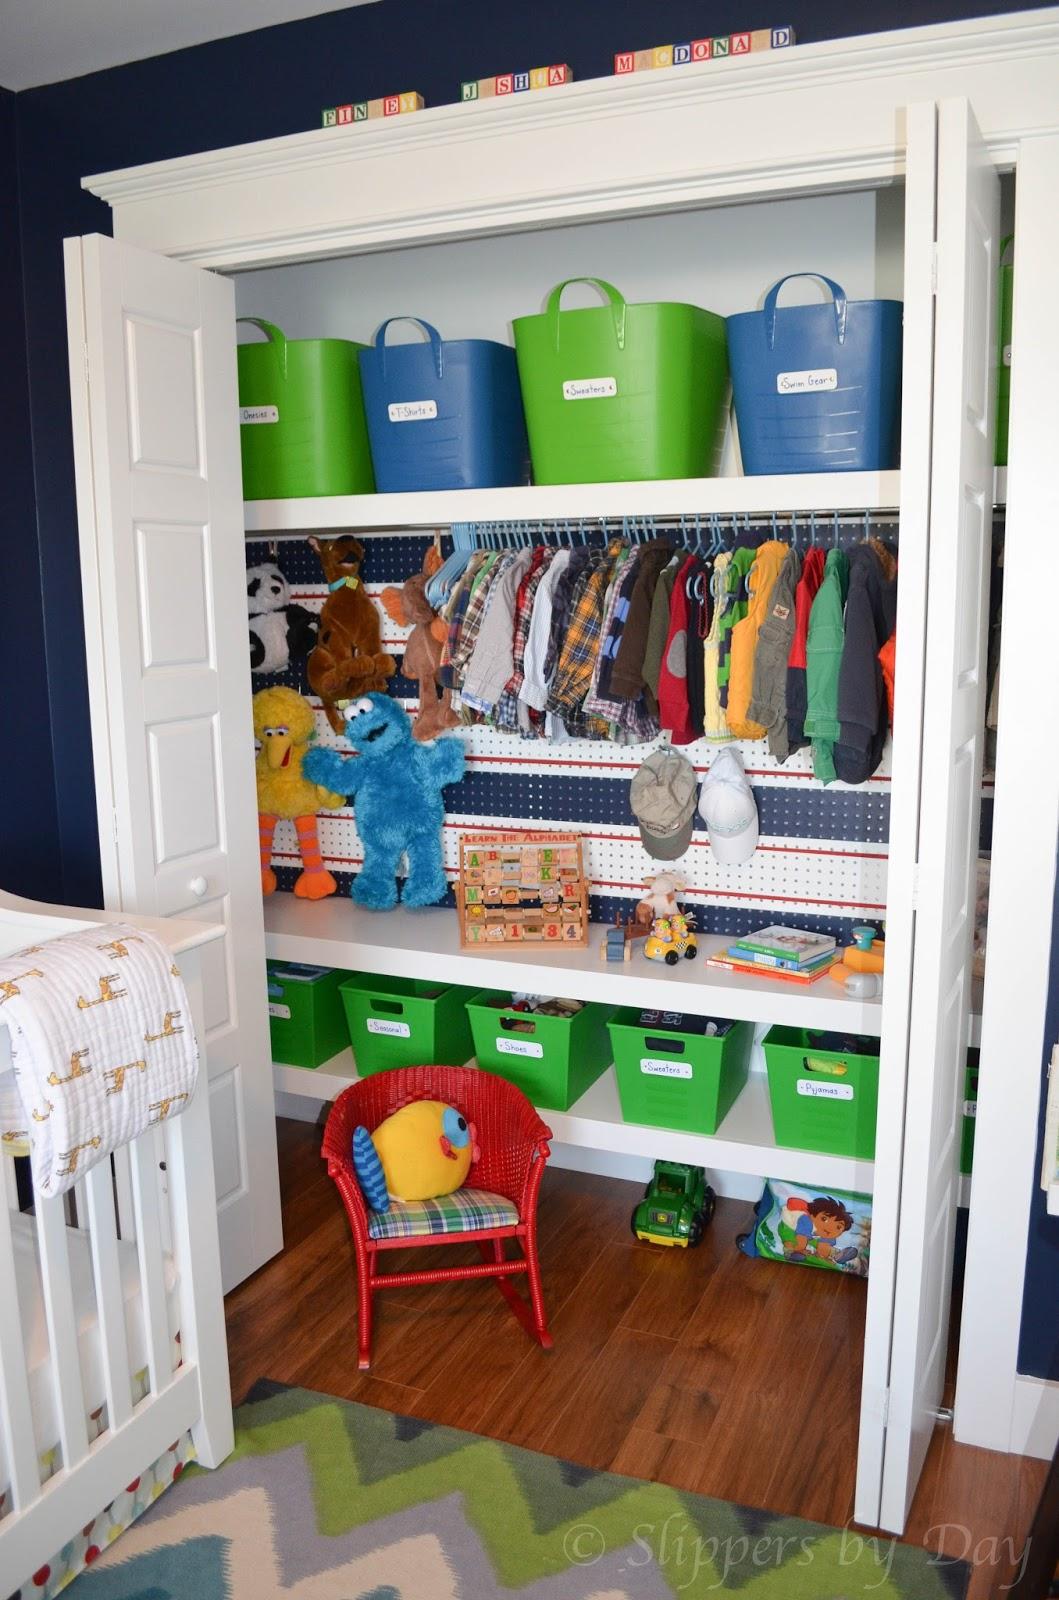 Slippers by Day: Kids Closet Organization